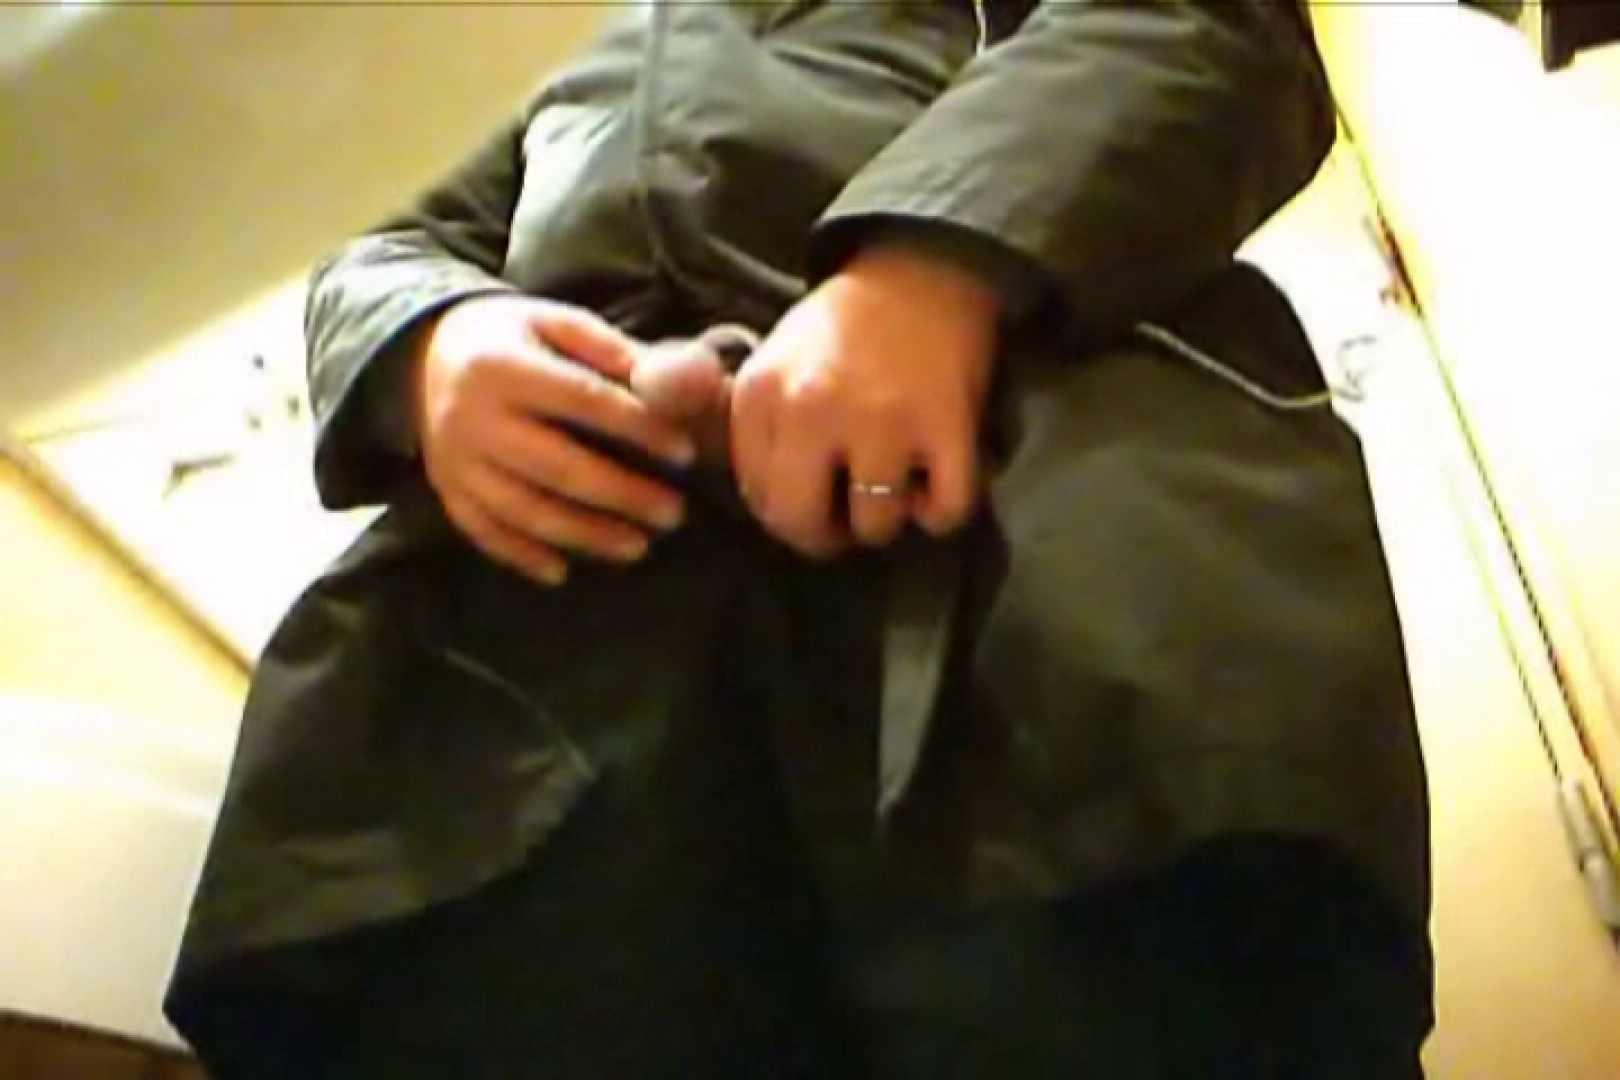 Gボーイ初投稿!掴み取りさんの洗面所覗き!in新幹線!VOL.15 覗きお宝 ゲイエロ画像 81連発 51